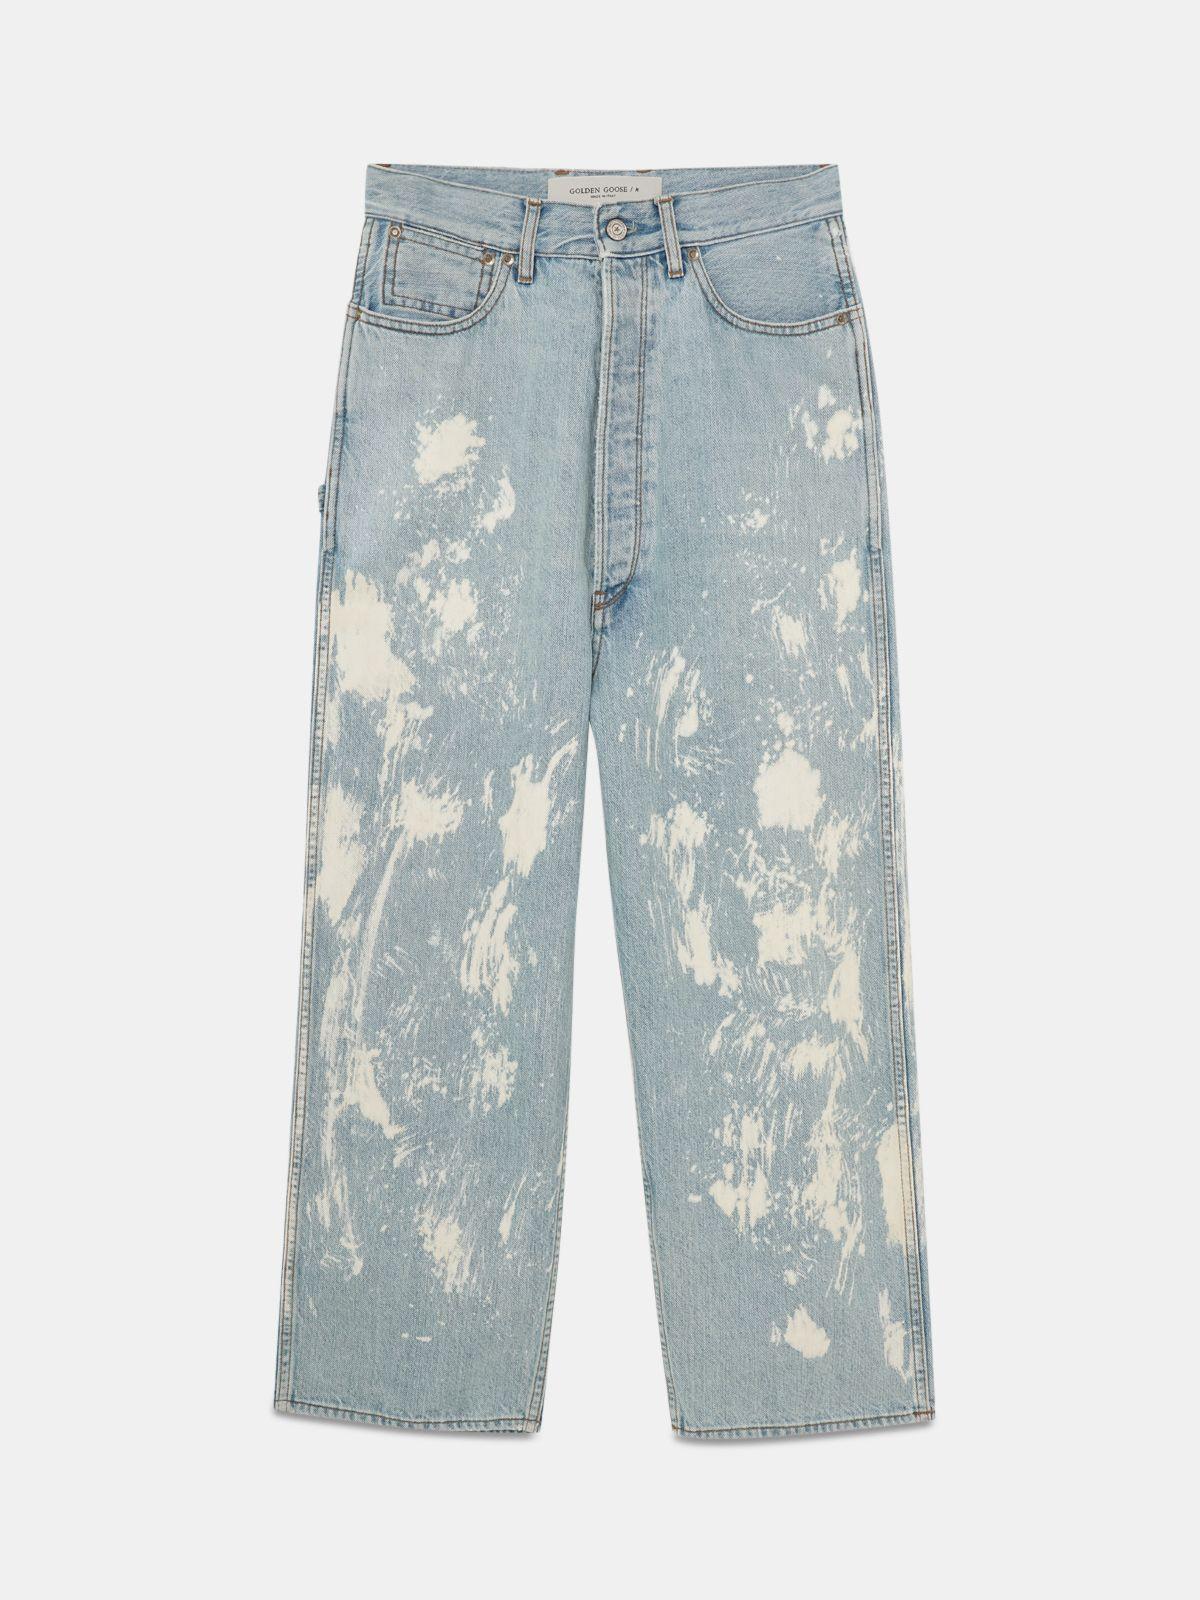 Golden Goose - Jeans Breezy in denim con effetto schiariture in